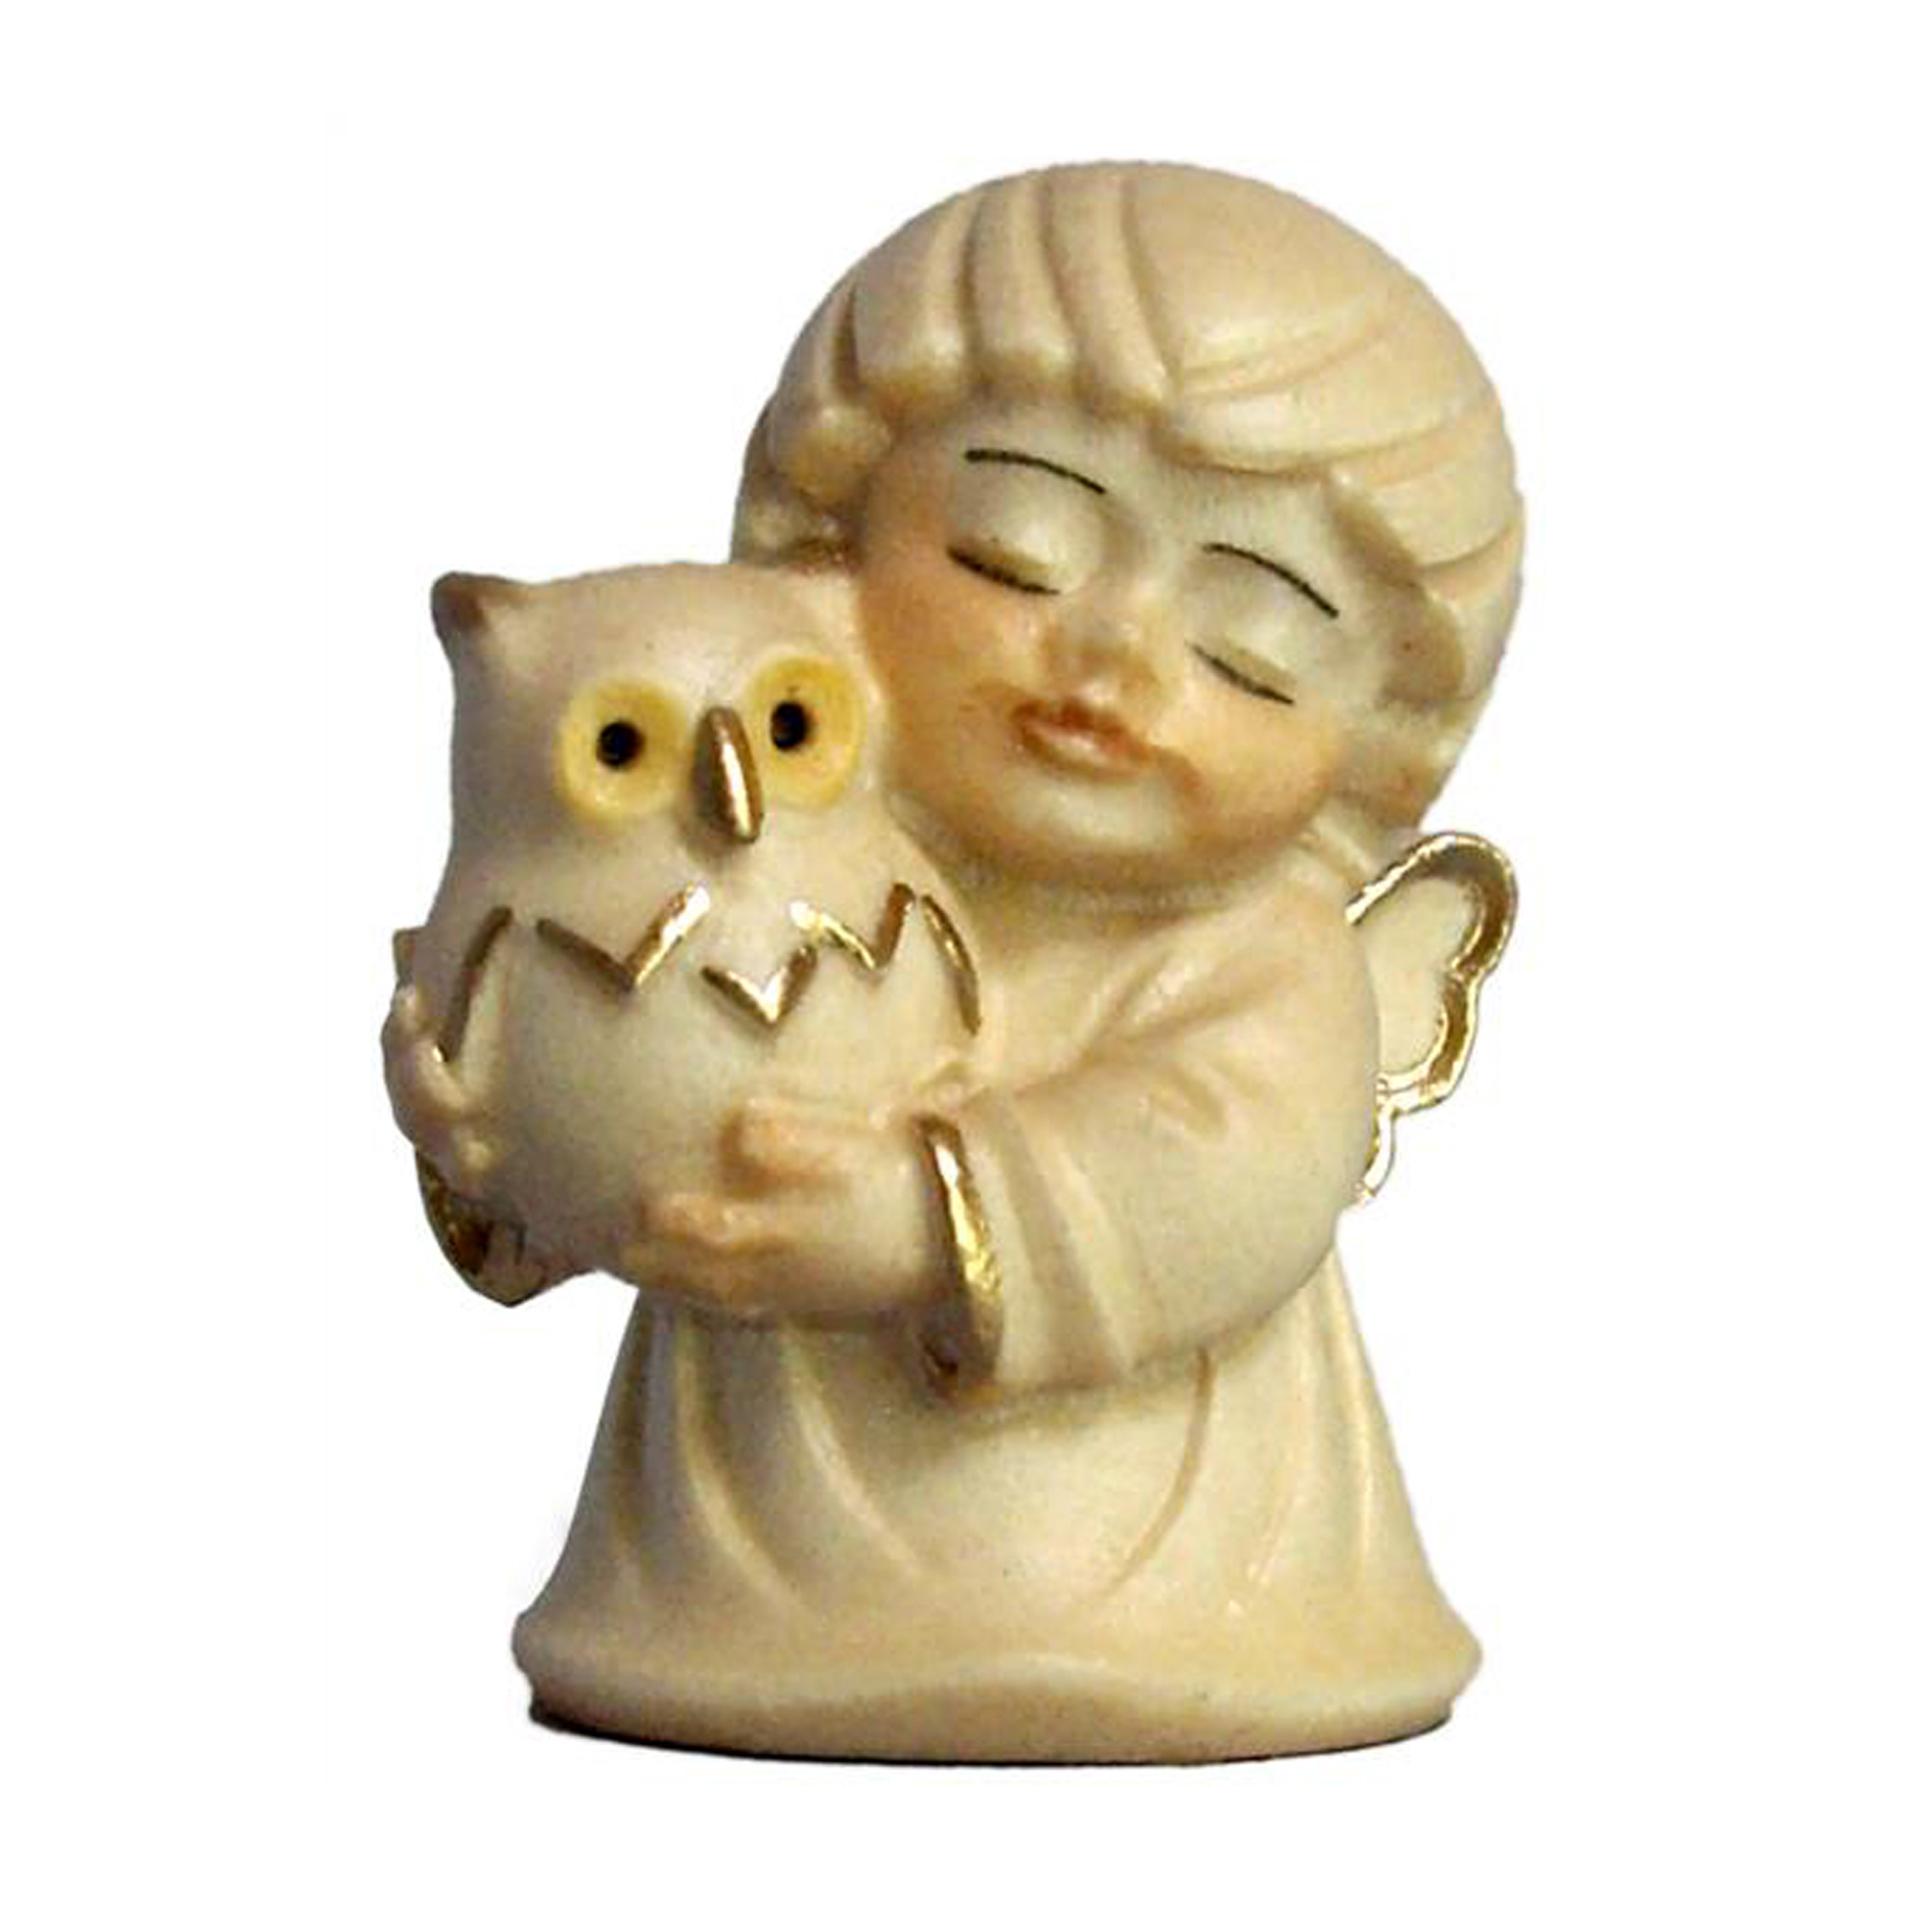 Engel mit Eule, alabaster